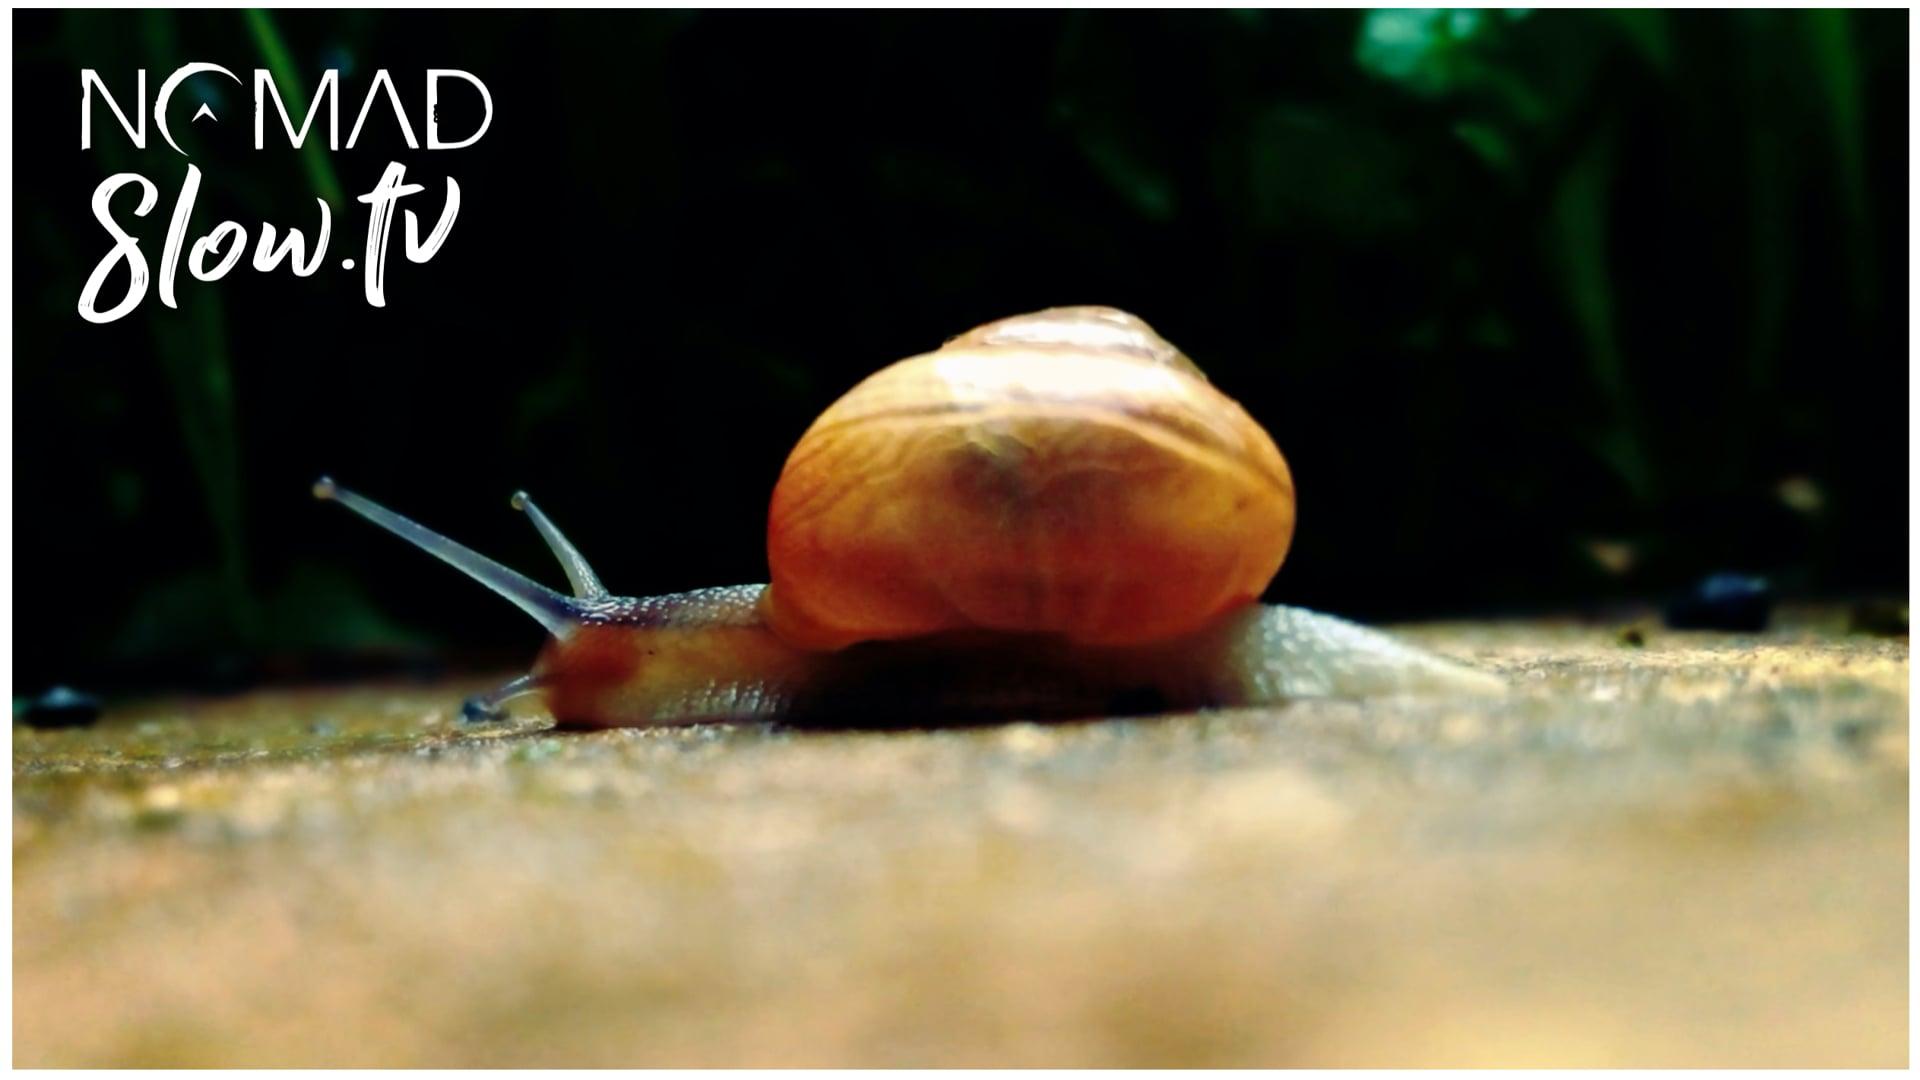 Even a snail will eventually reach its destination